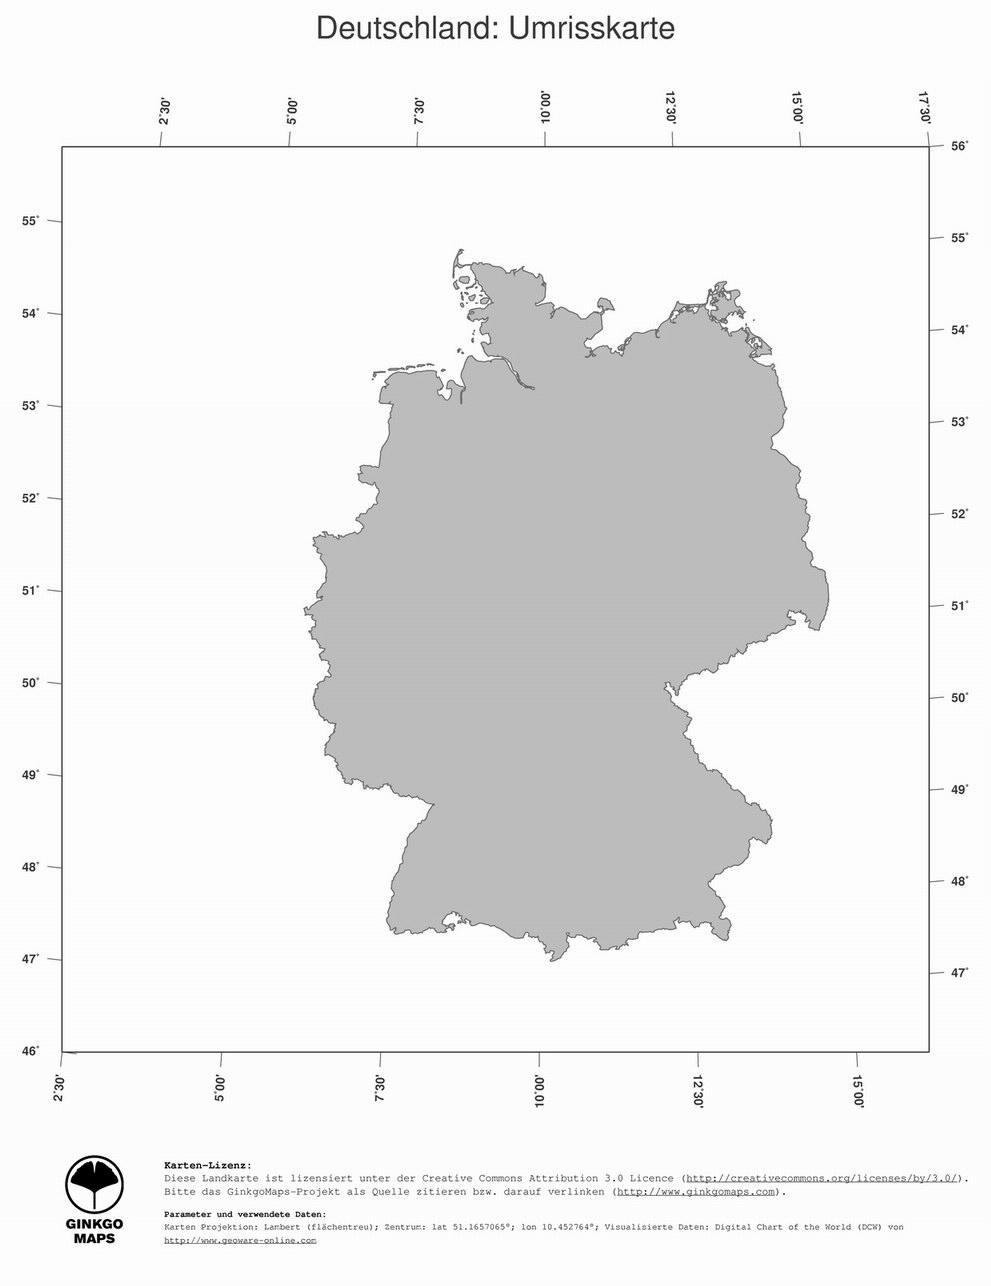 Landkarte Deutschland - Deutschlandkarte - Deutschland Landkarte mit Deutschlandkarte Bundesländer Blanko